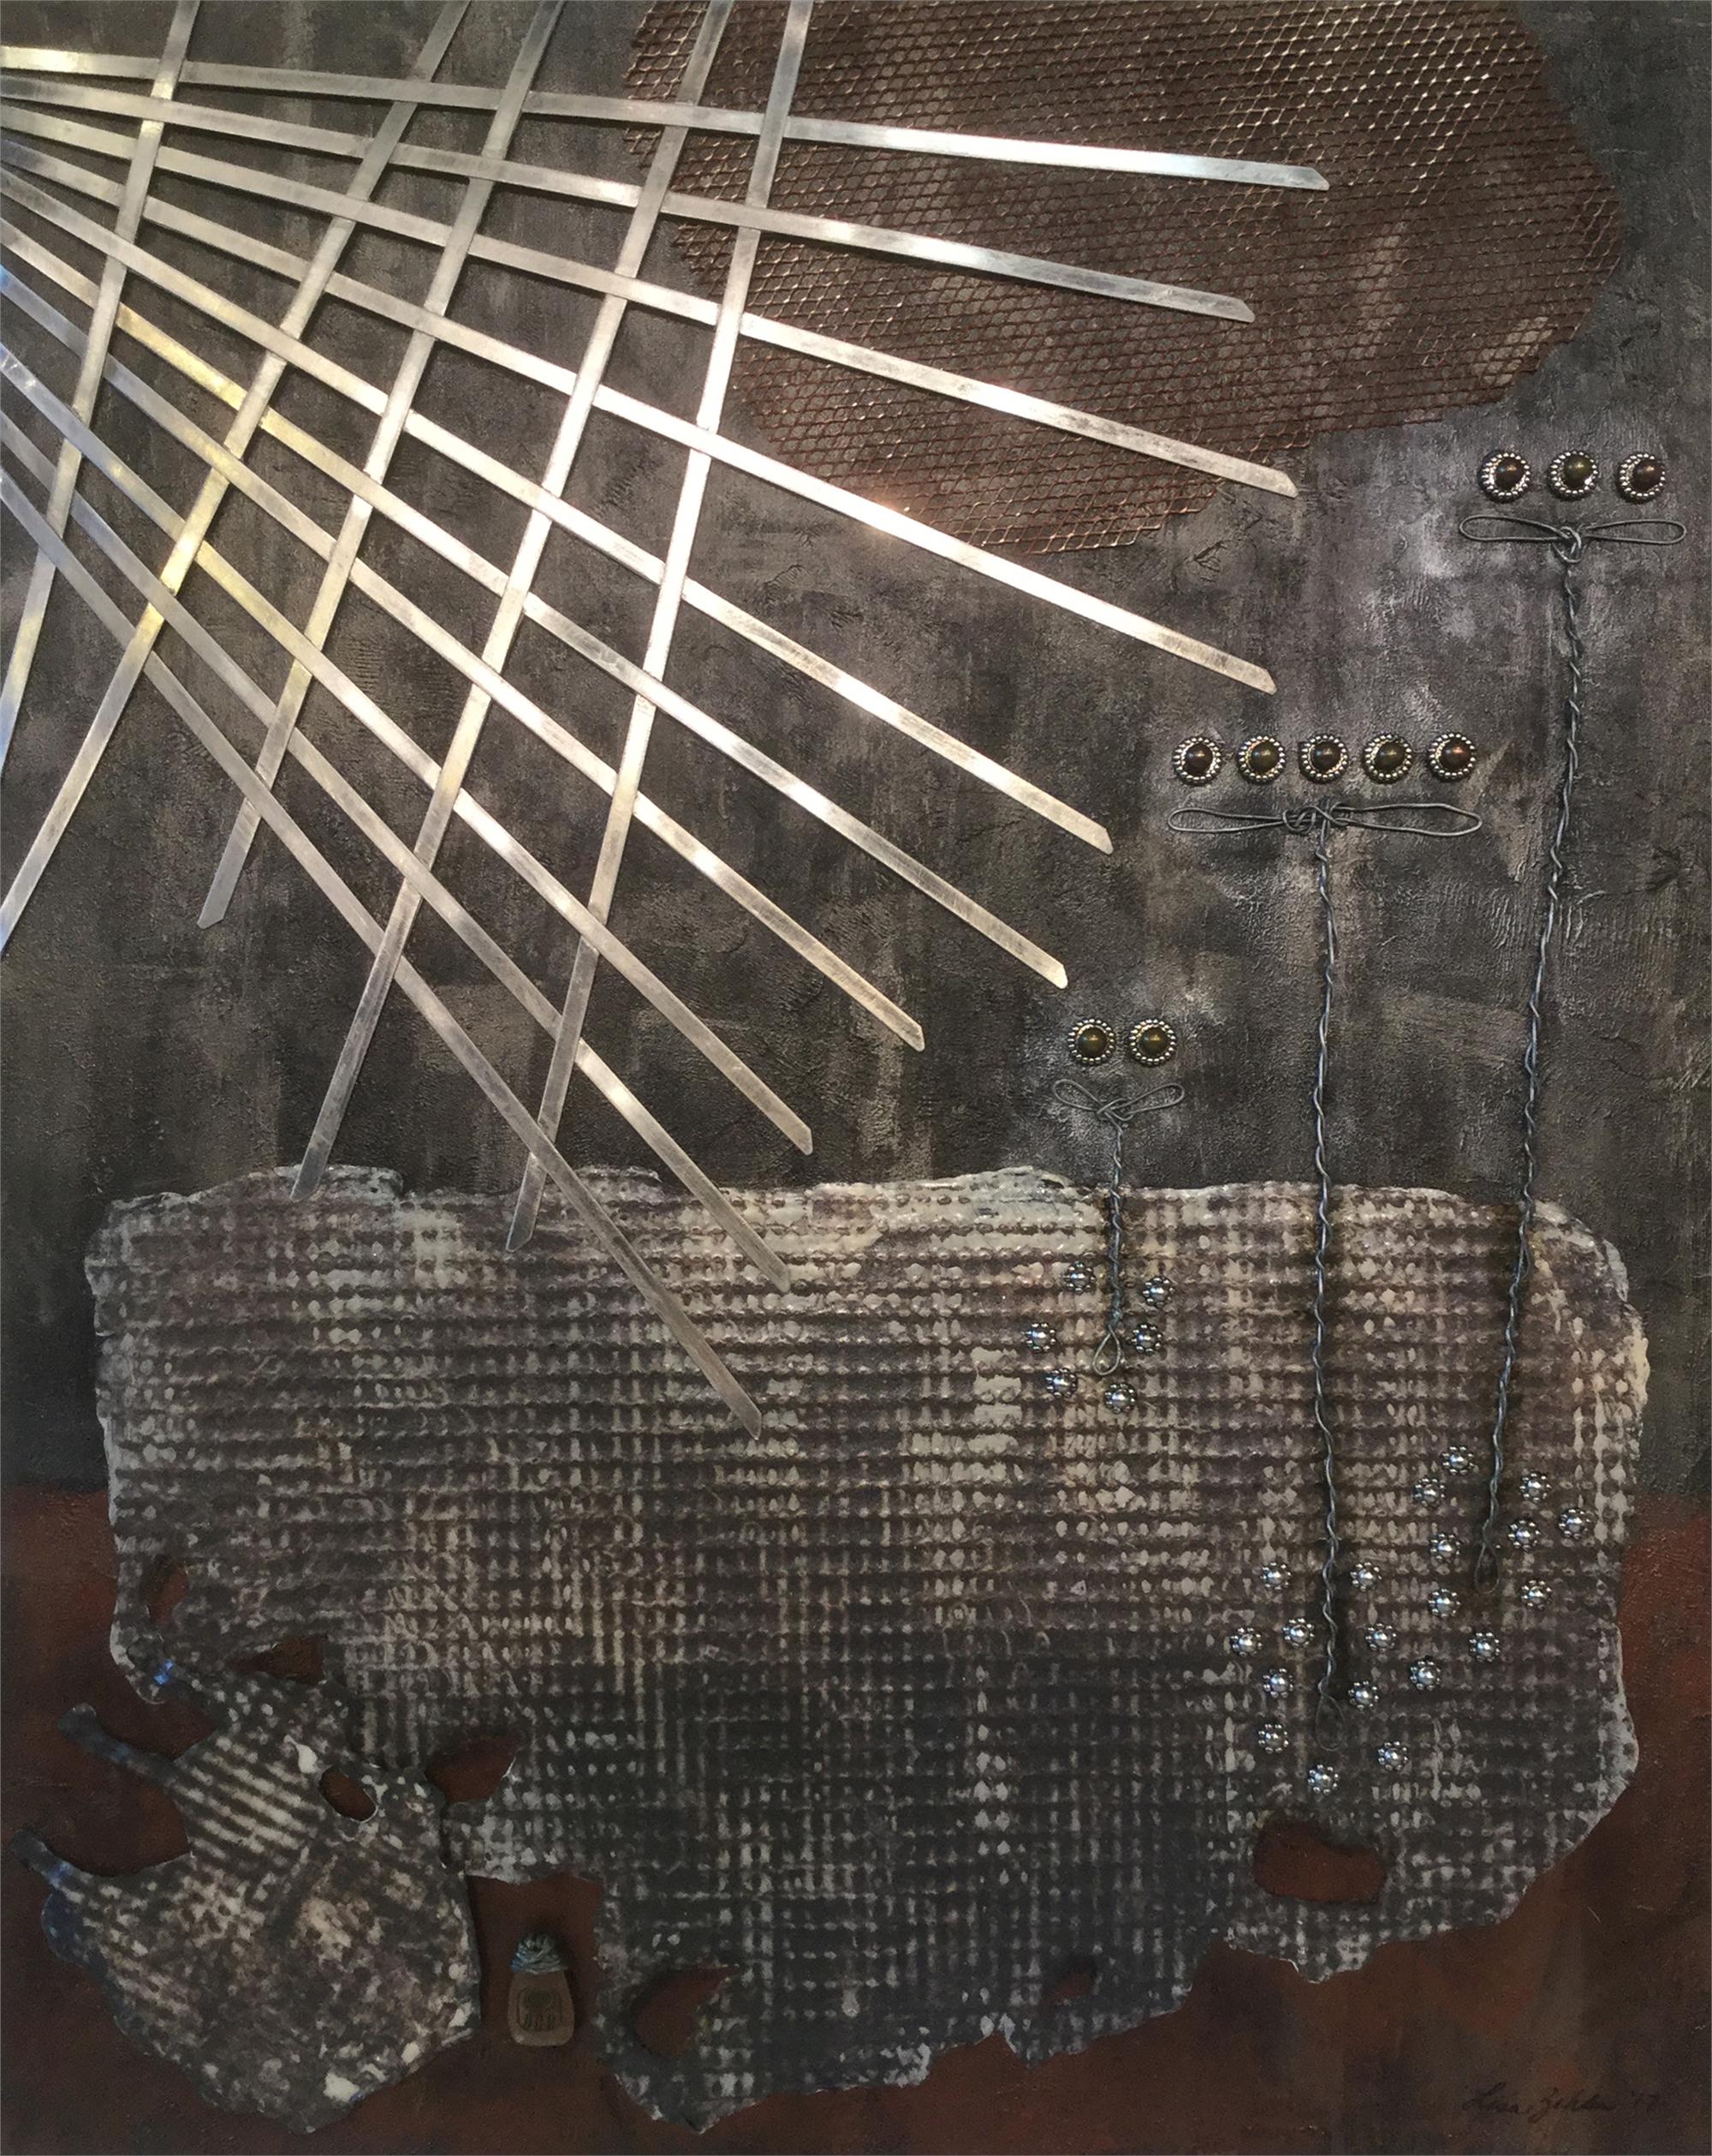 Otherwordly Lanscape - Radiance by Lisa Zahler (Lafayette, OR)